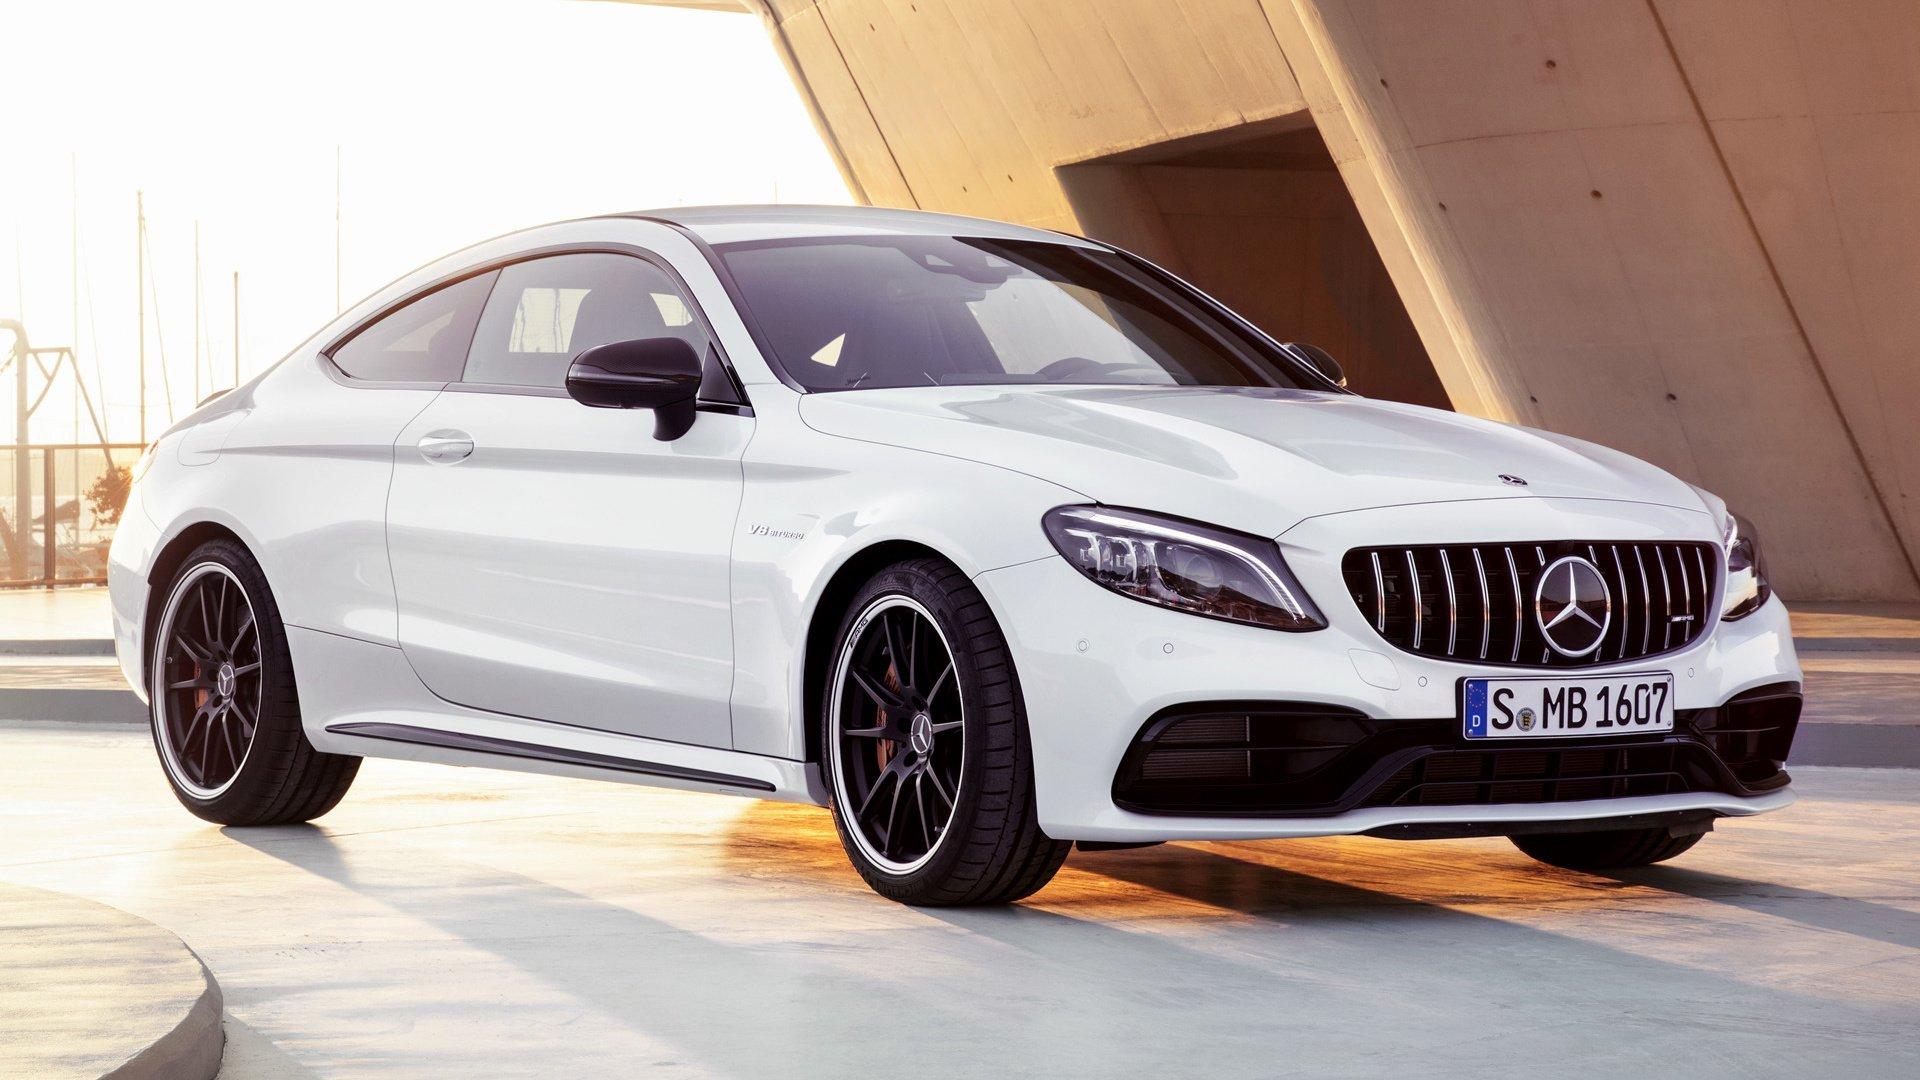 2018 Mercedes Amg C 63 S Coupe Papel De Parede Hd Plano De Fundo 1920x1080 Id 926594 Wallpaper Abyss